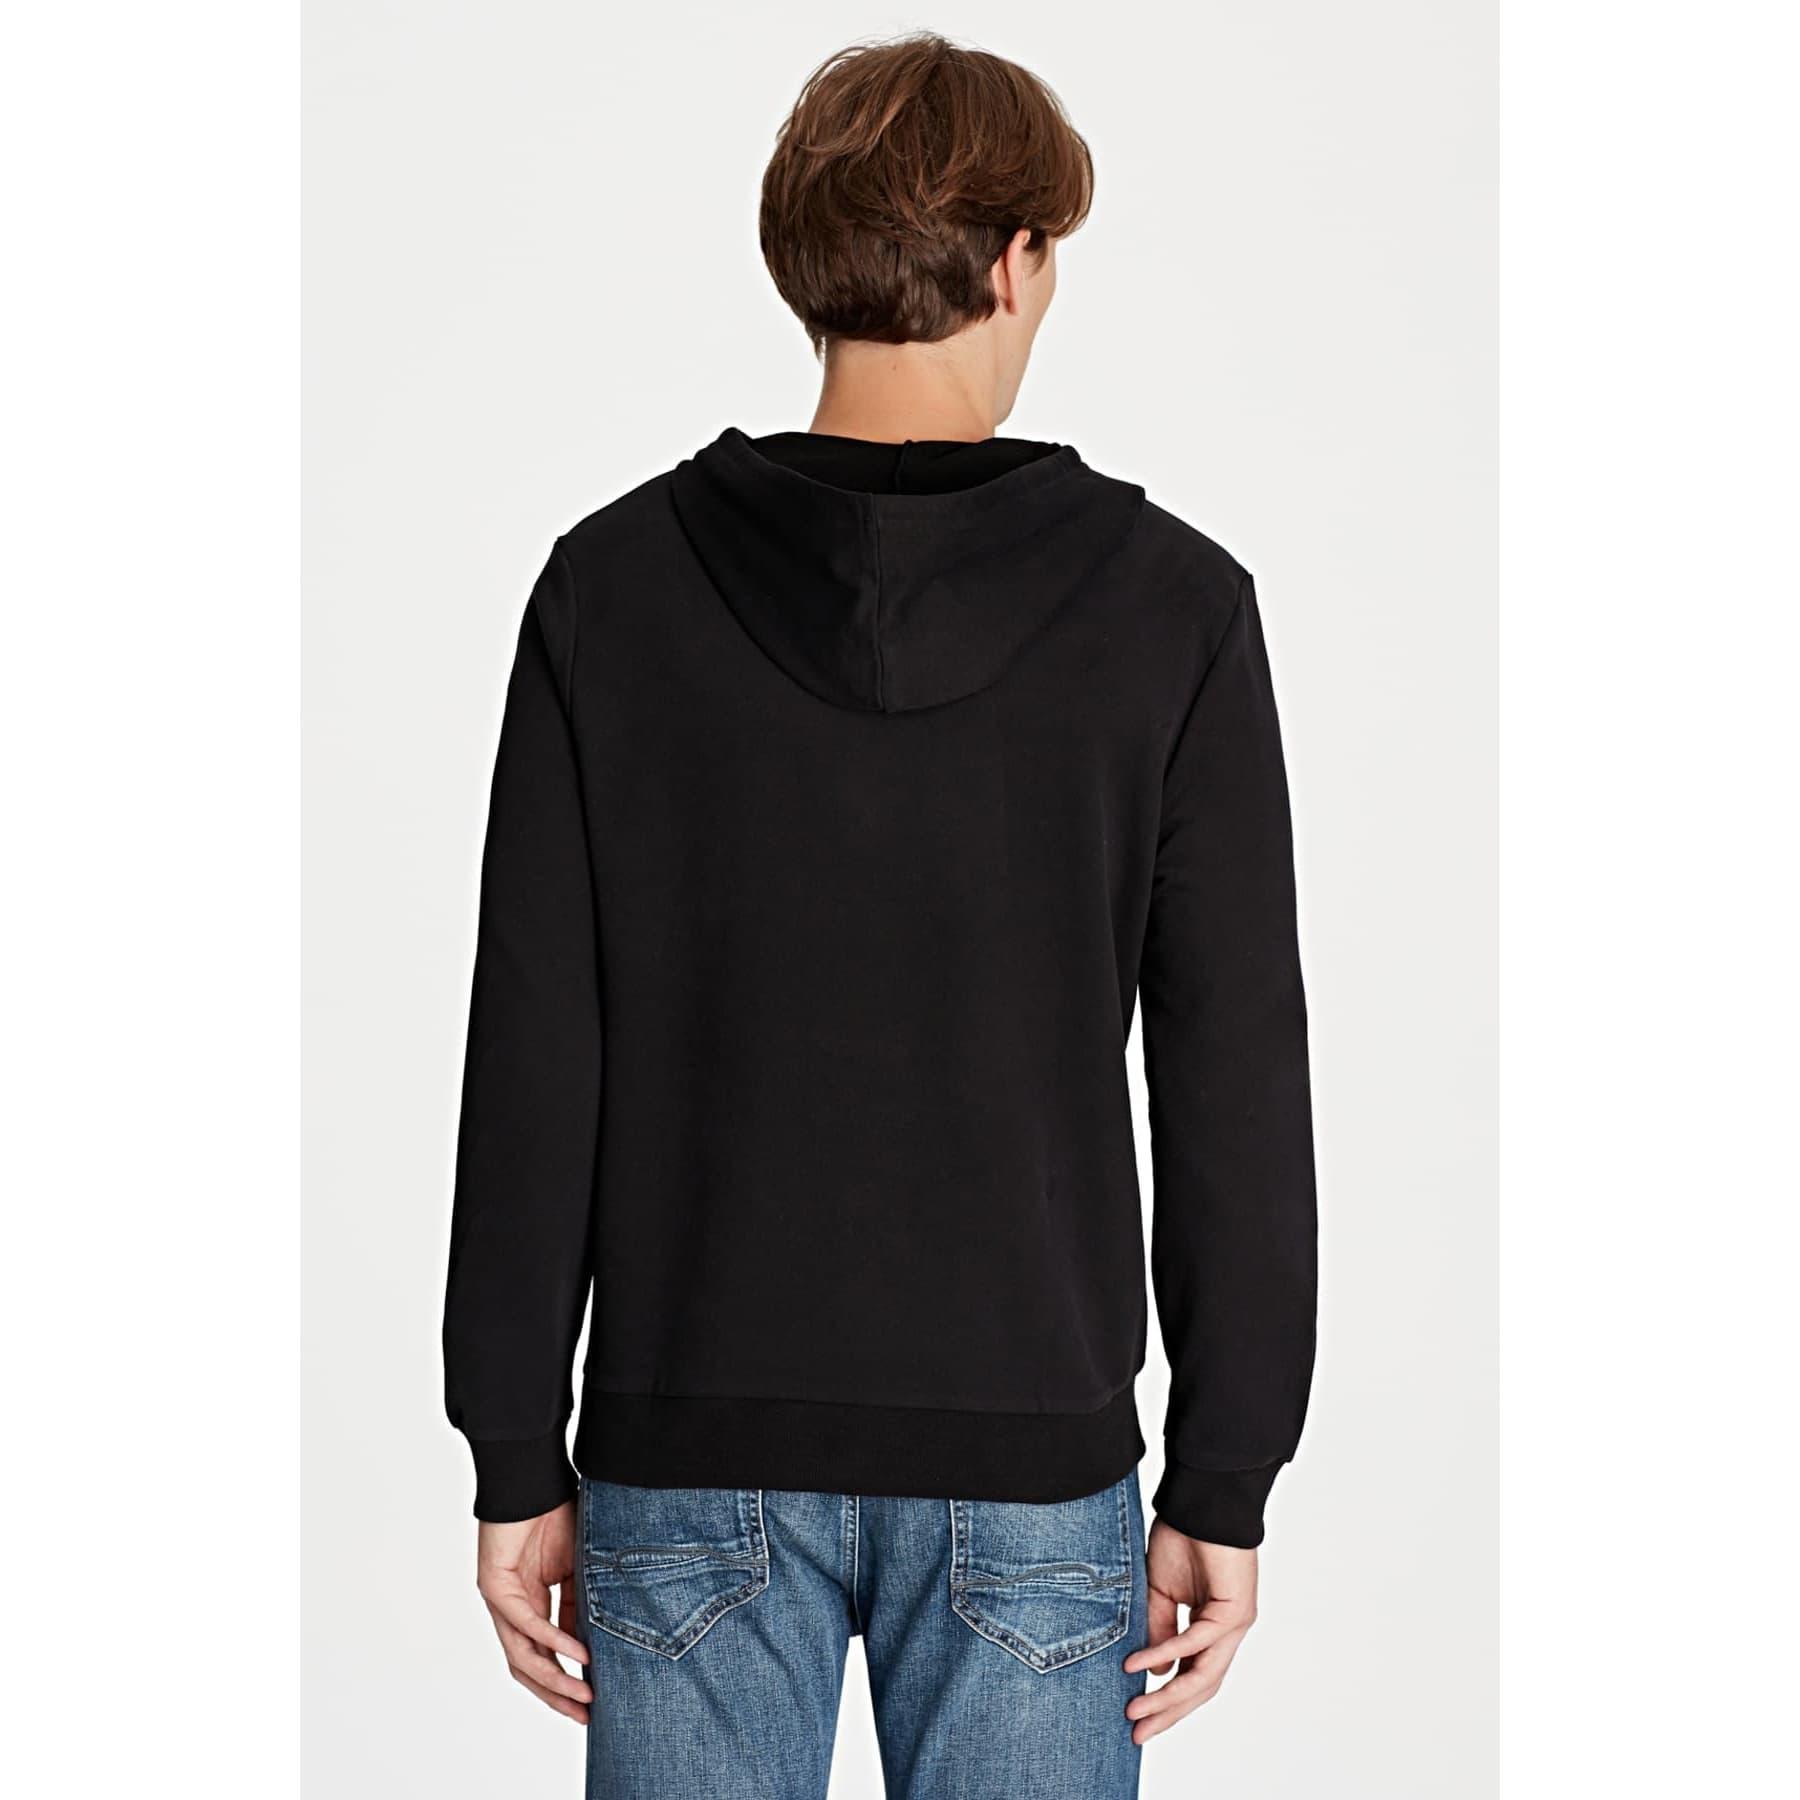 Mavi Jeans Erkek Siyah Kapüşonlu Sweatshirt